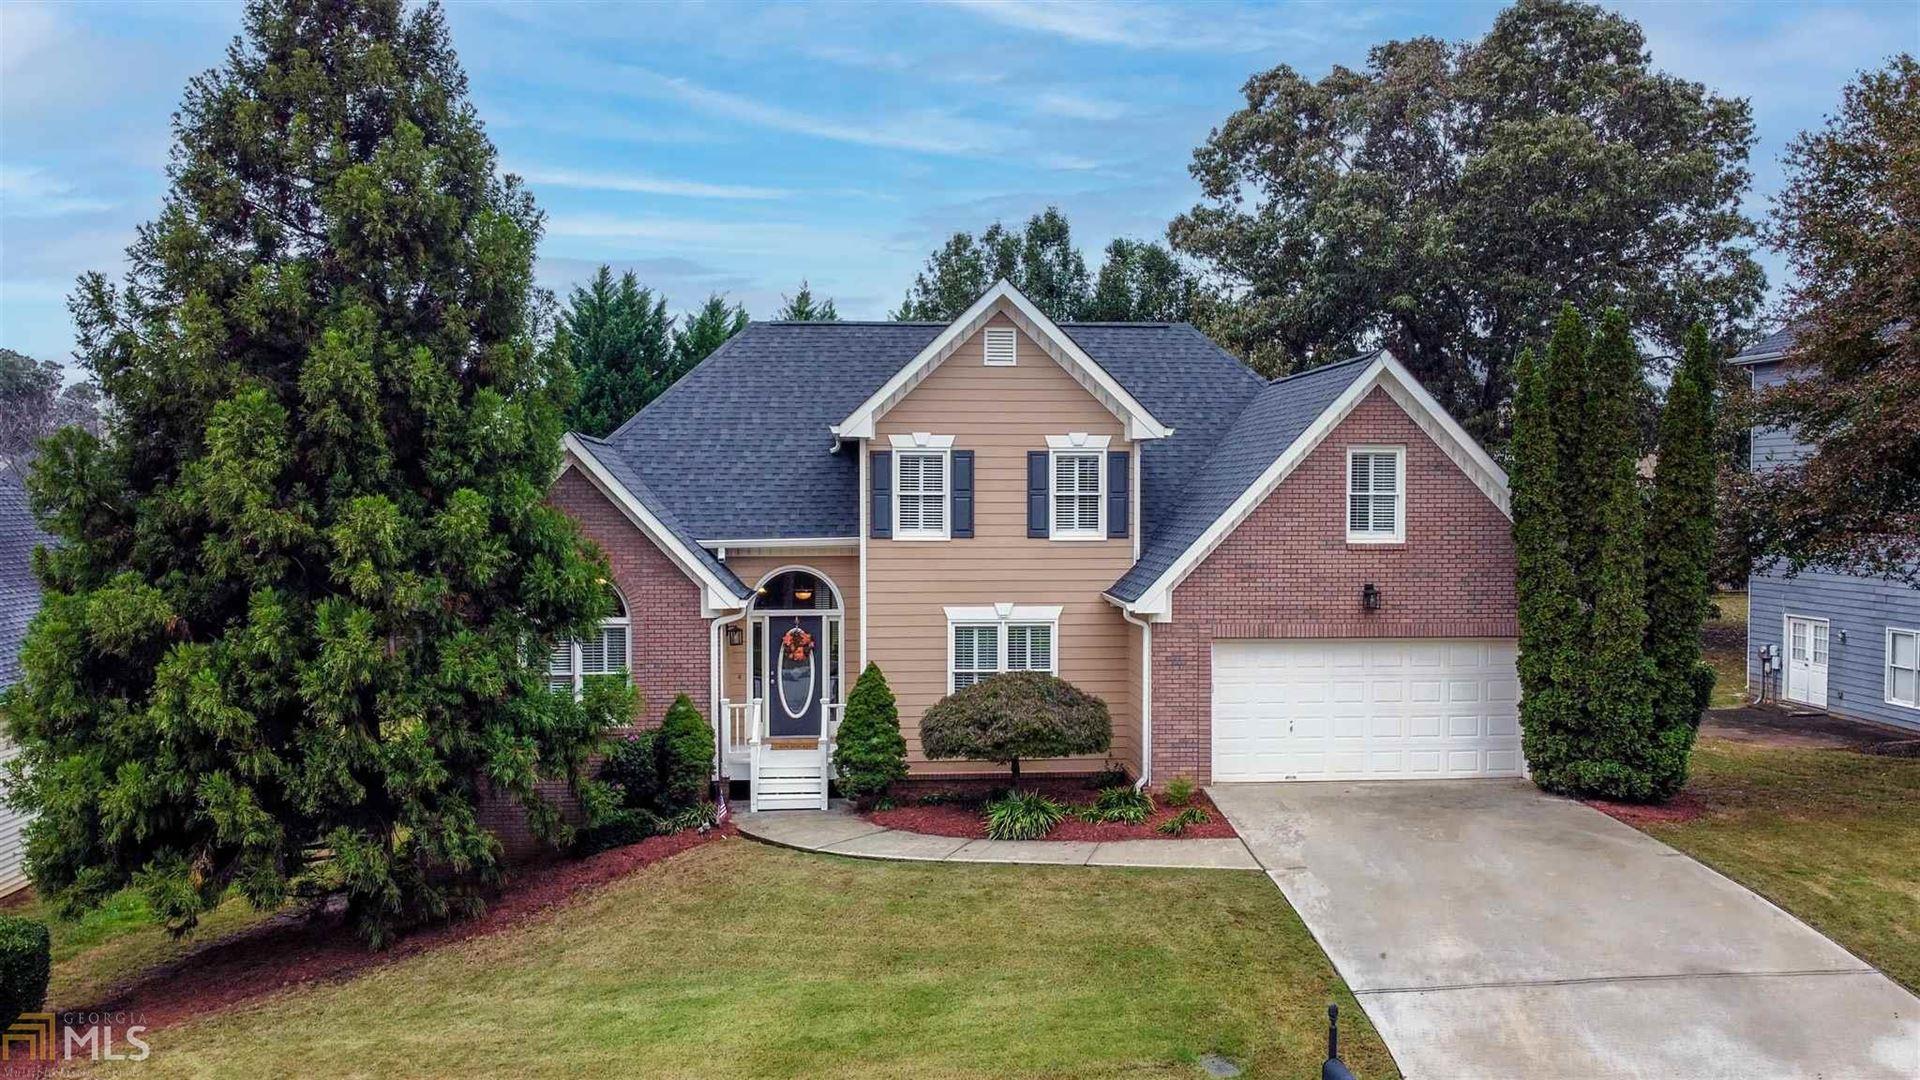 925 Common Oak Pl, Lawrenceville, GA 30045 - MLS#: 8881439